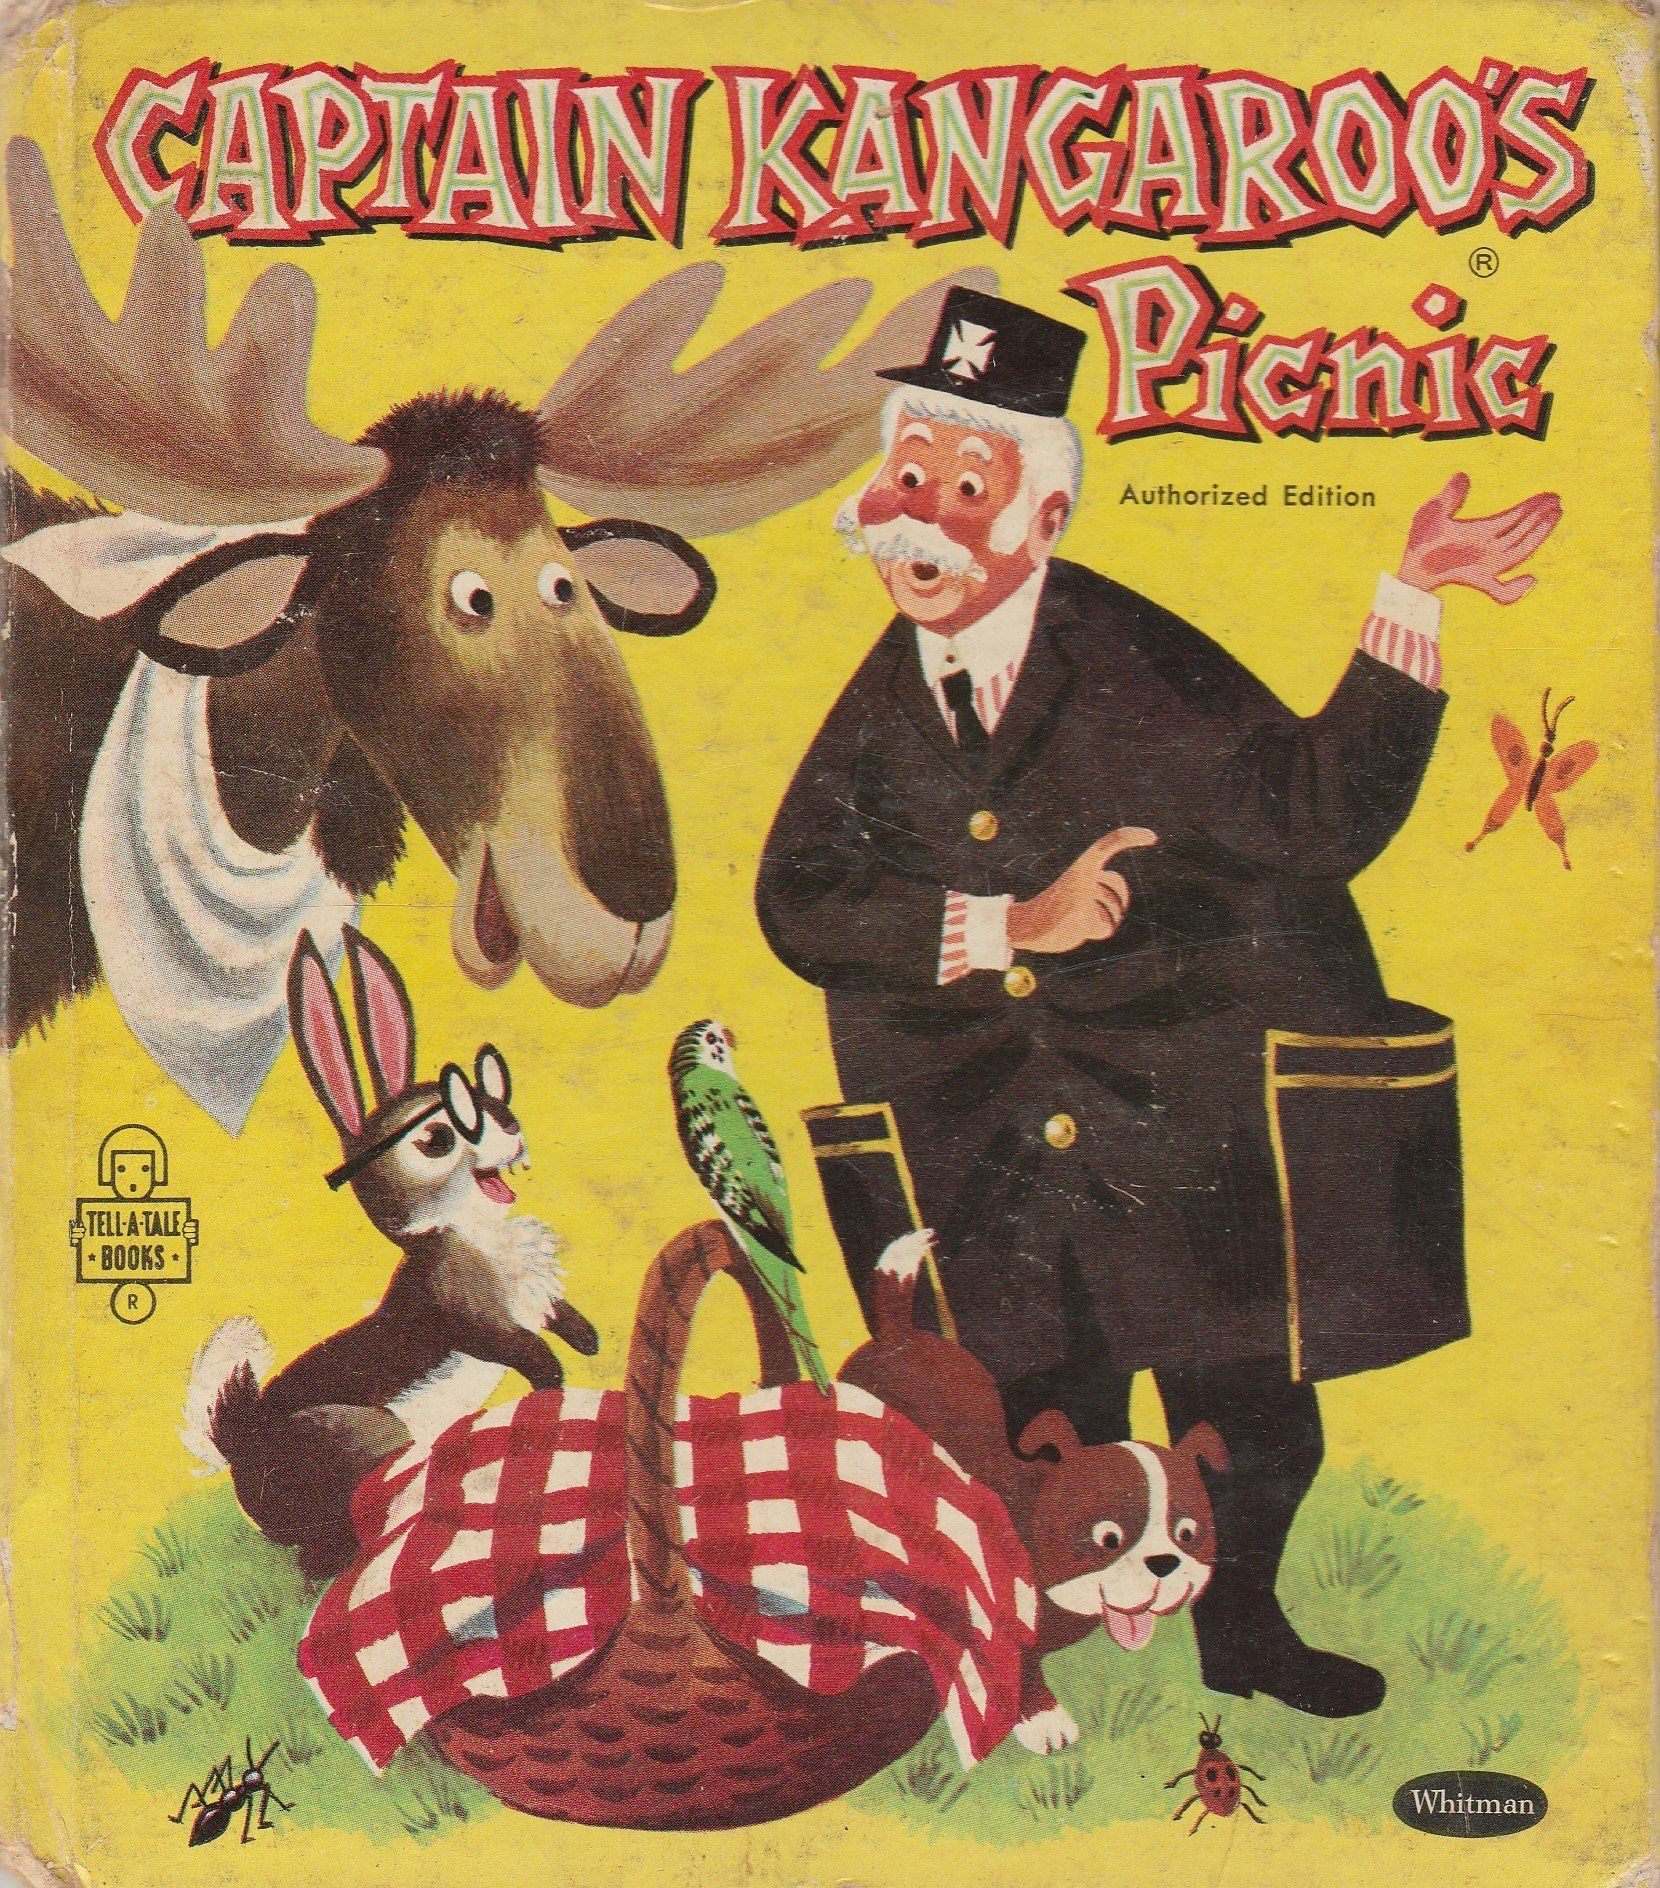 Captain Kangaroo's Picnic By Mary Voell Jones 1959 Whitman